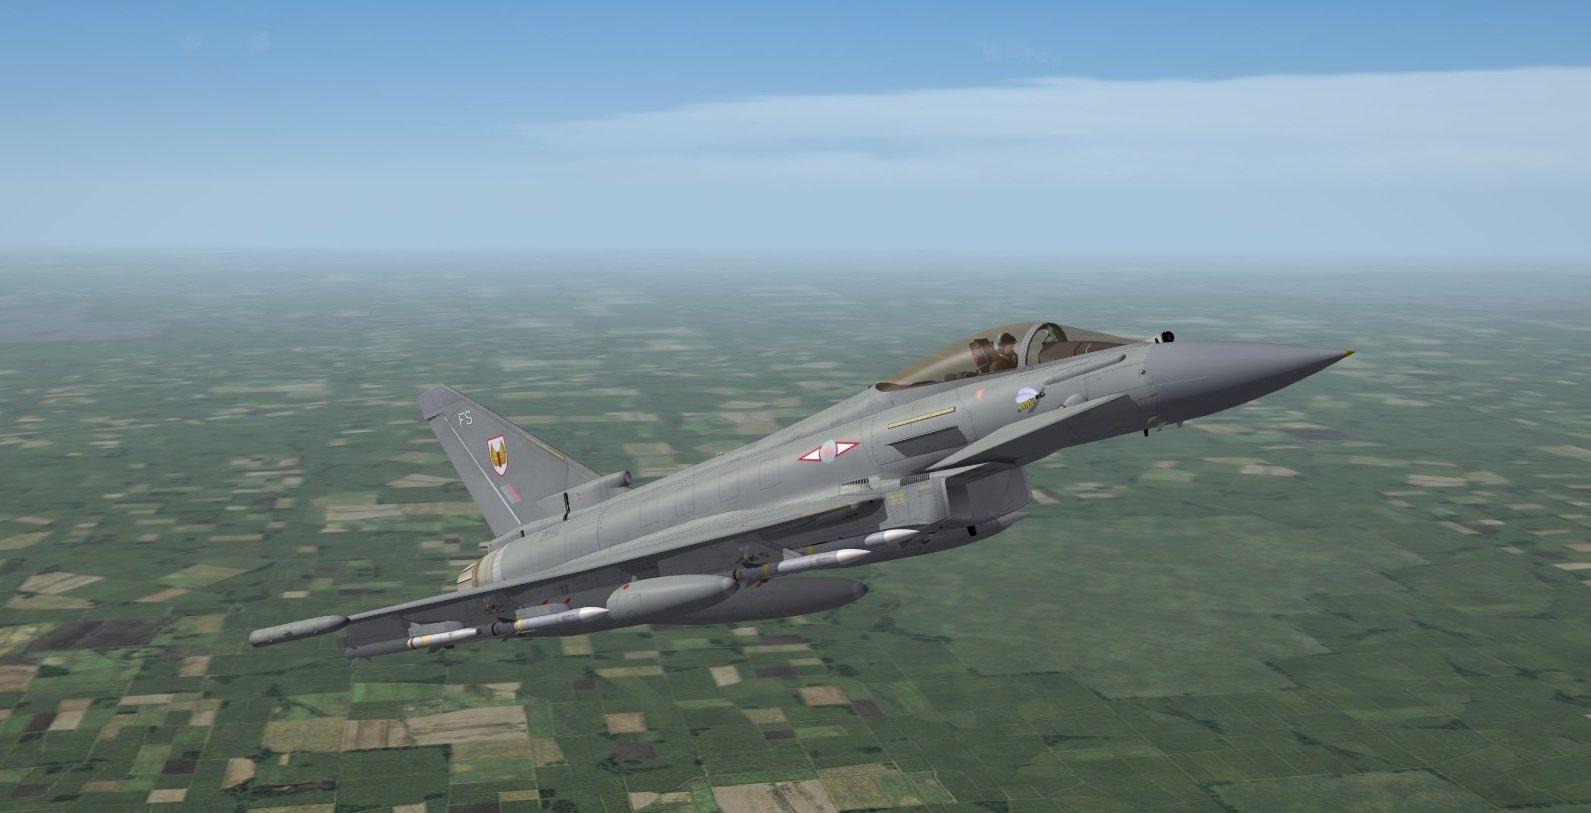 Typhoon, No.1 Squadron Royal Air Force